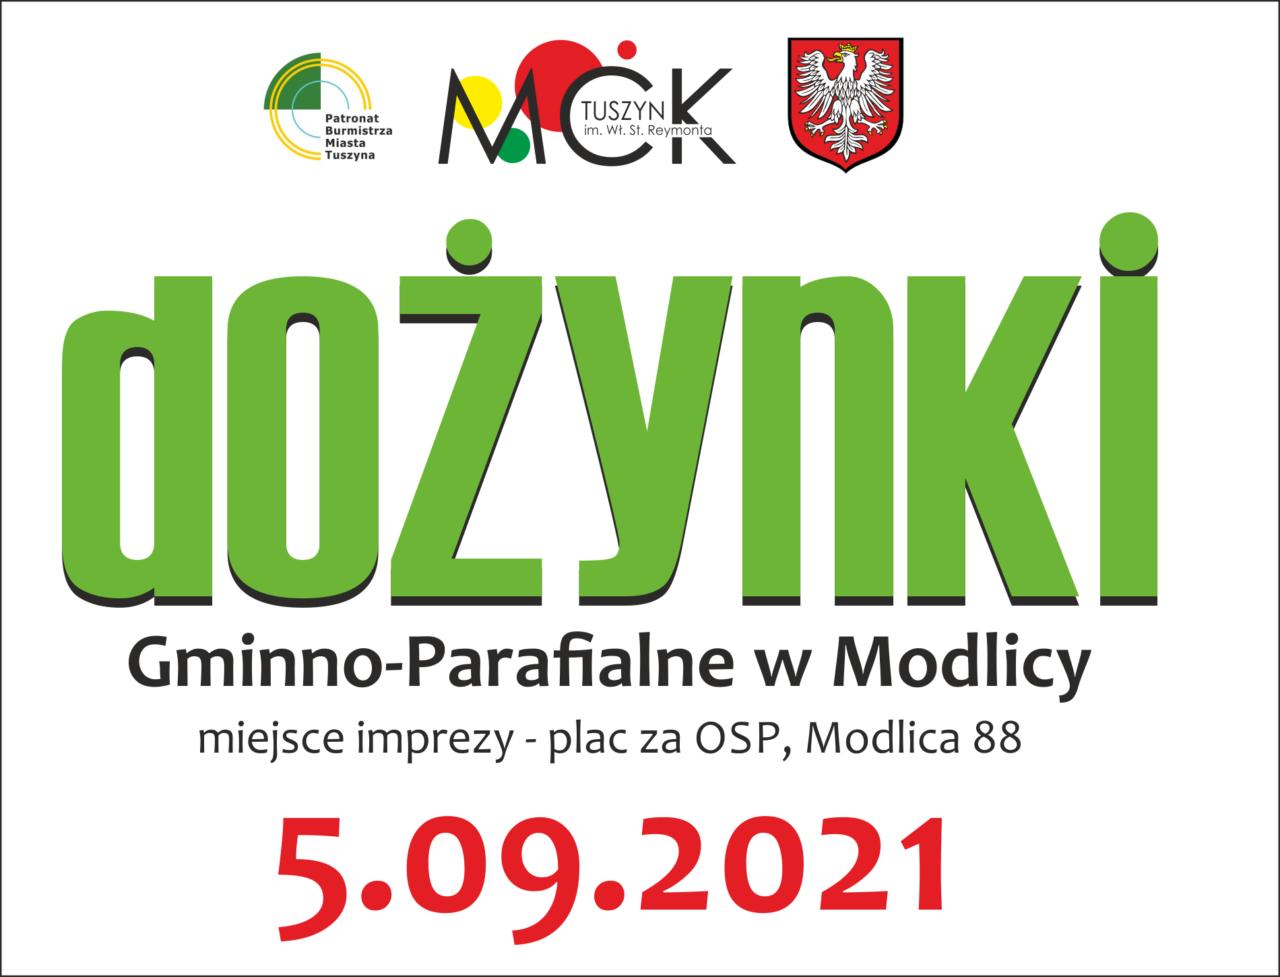 https://mcktuszyn.pl/wp-content/uploads/2021/08/dozynki-21_mini-1280x977.png